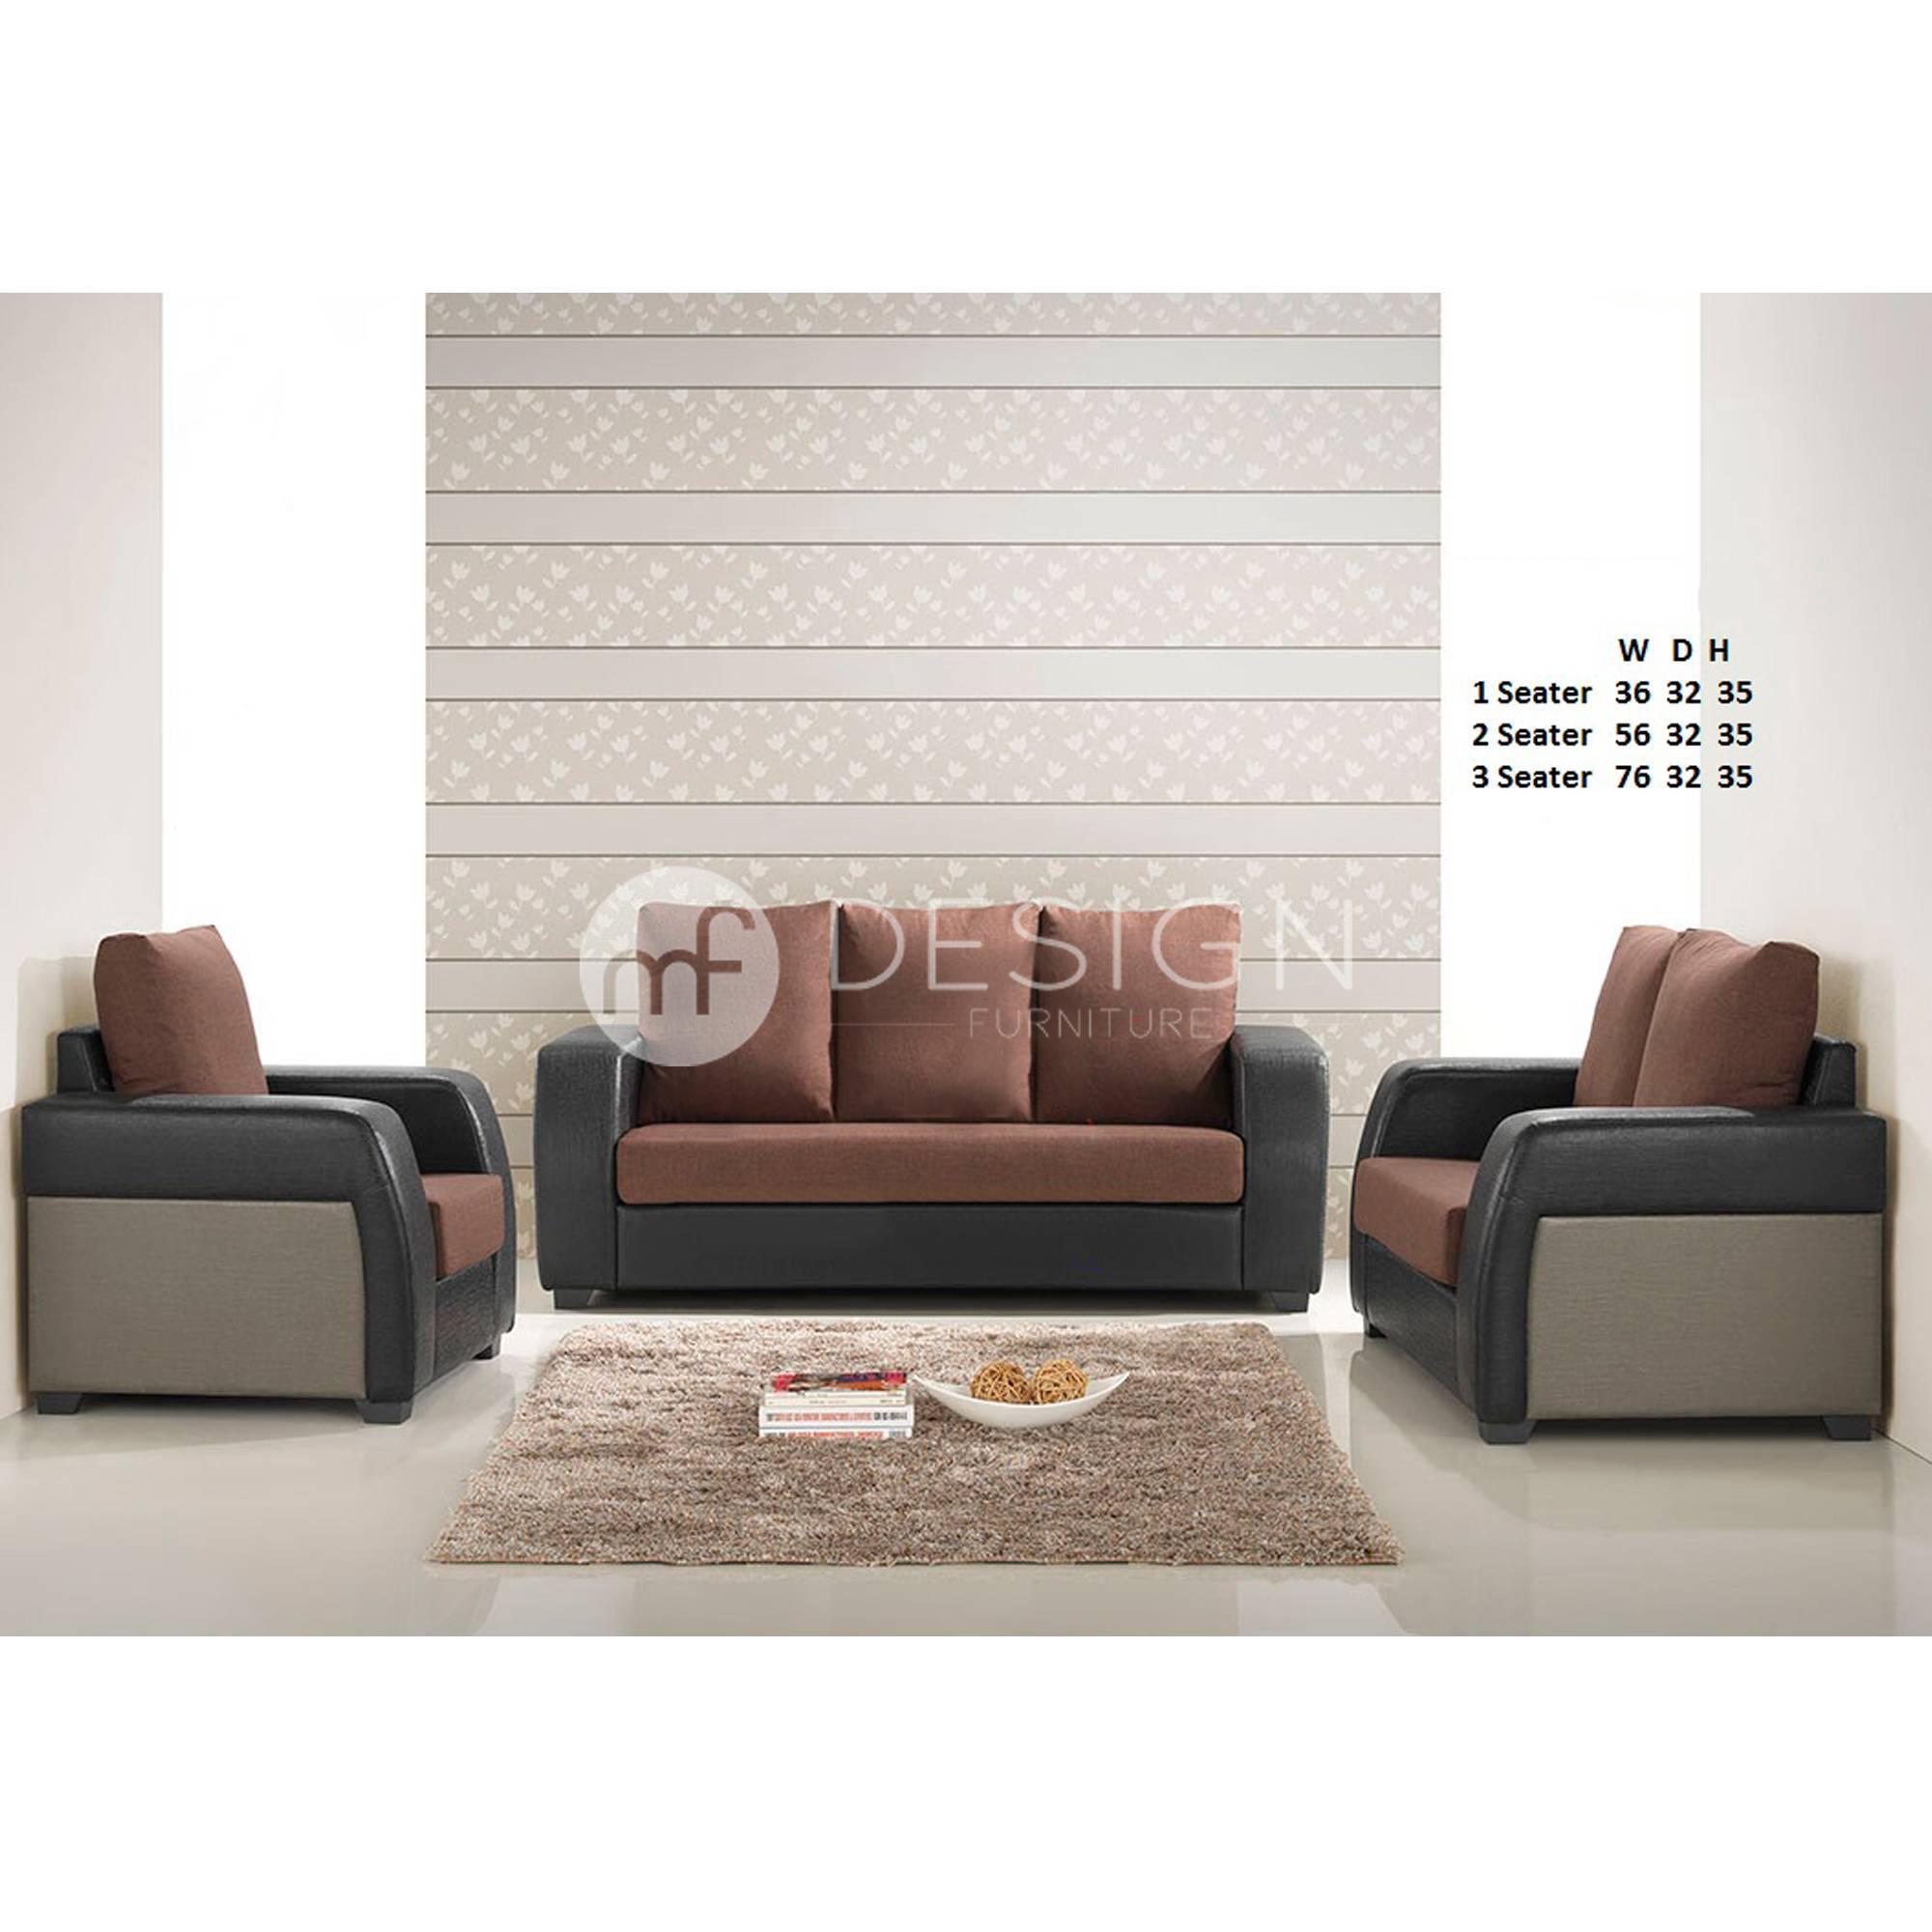 Mf Design Norwich 1 2 3 Sofa Set